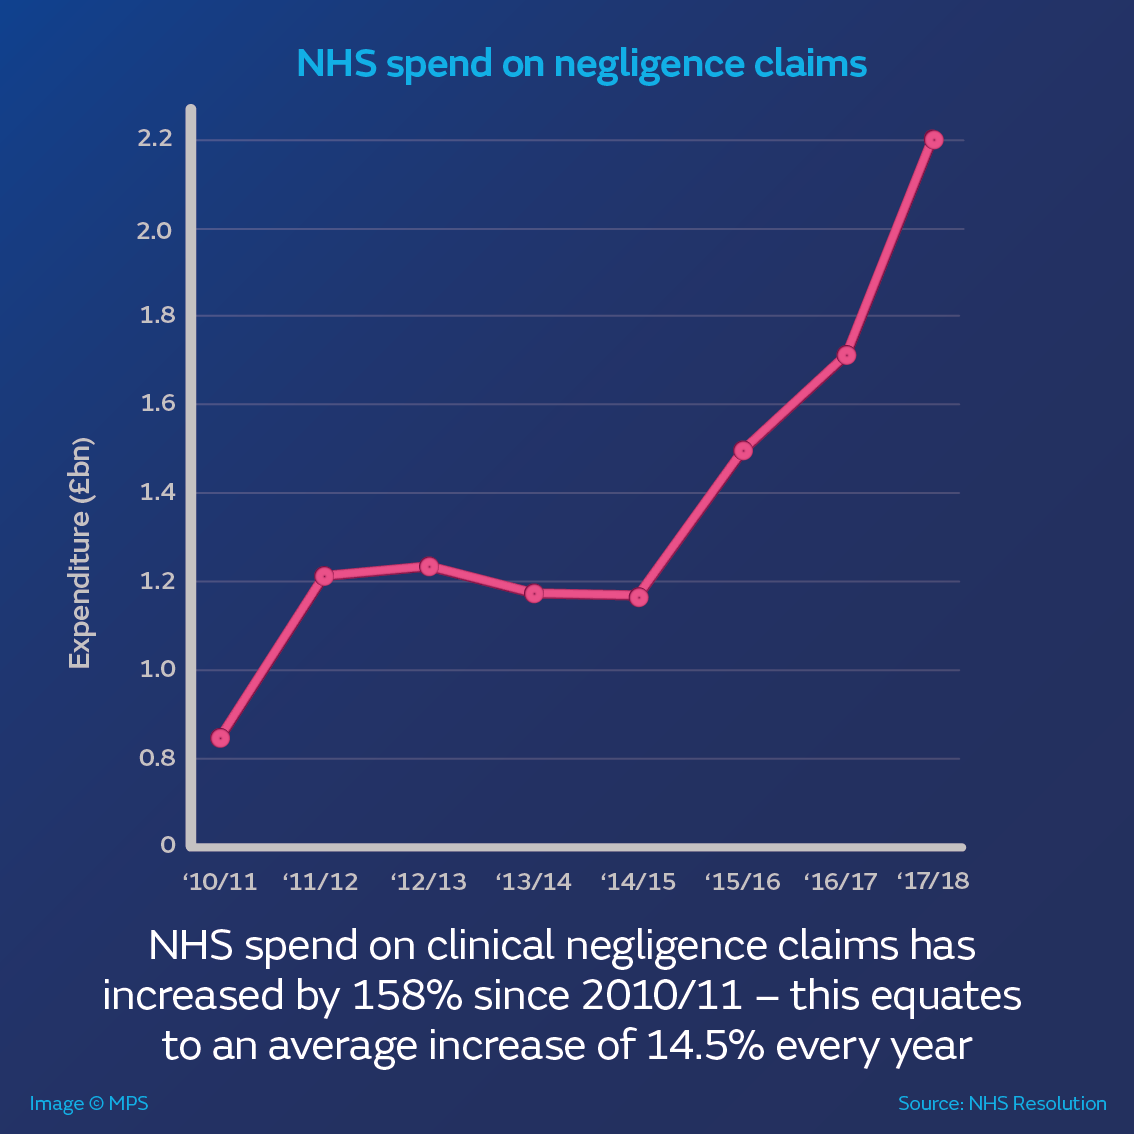 NHS spend